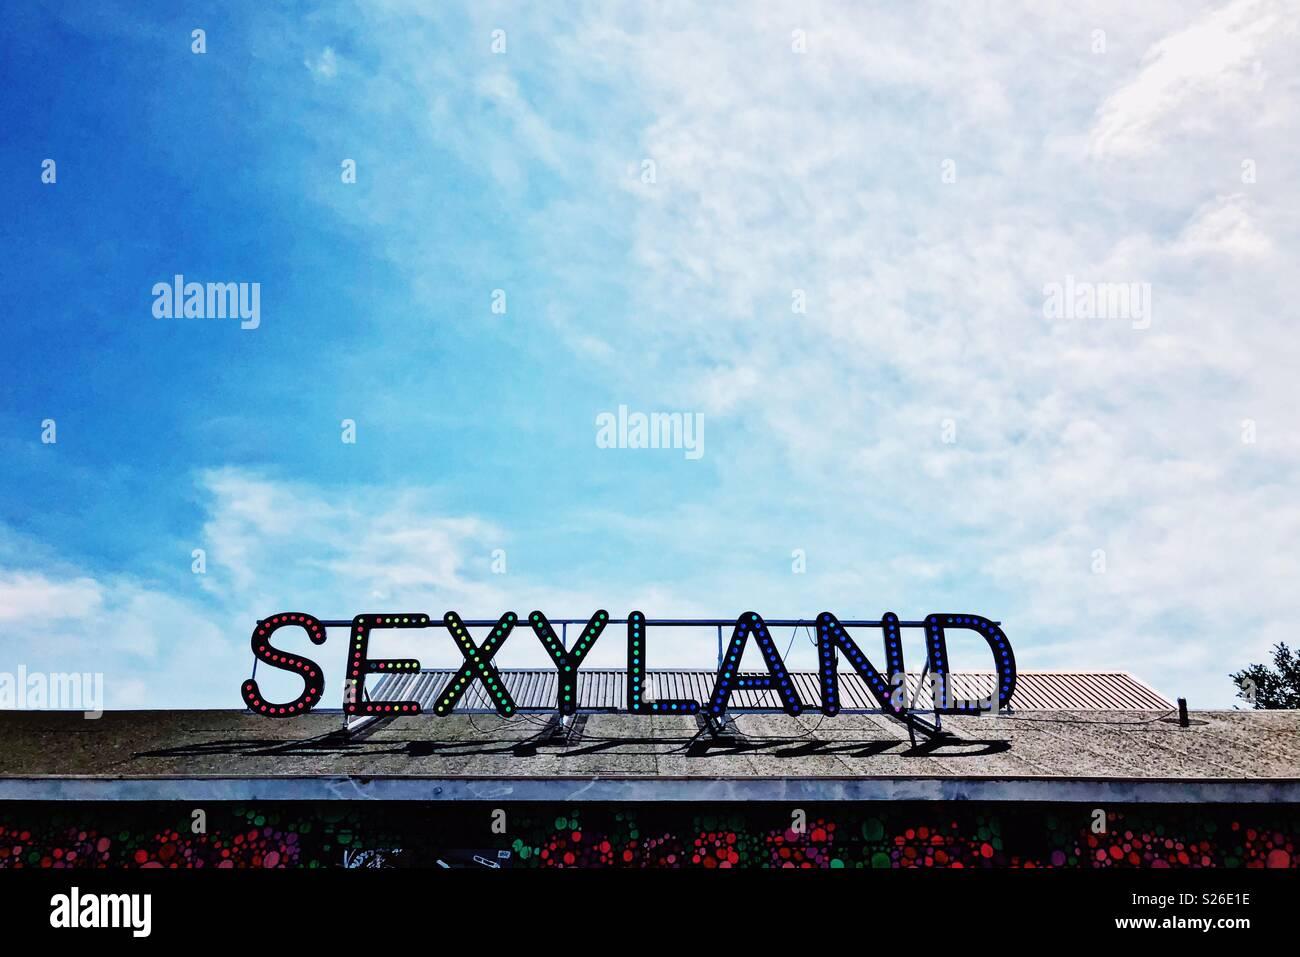 Sexyland discoteca / lugar en NDSM, Amsterdam Imagen De Stock